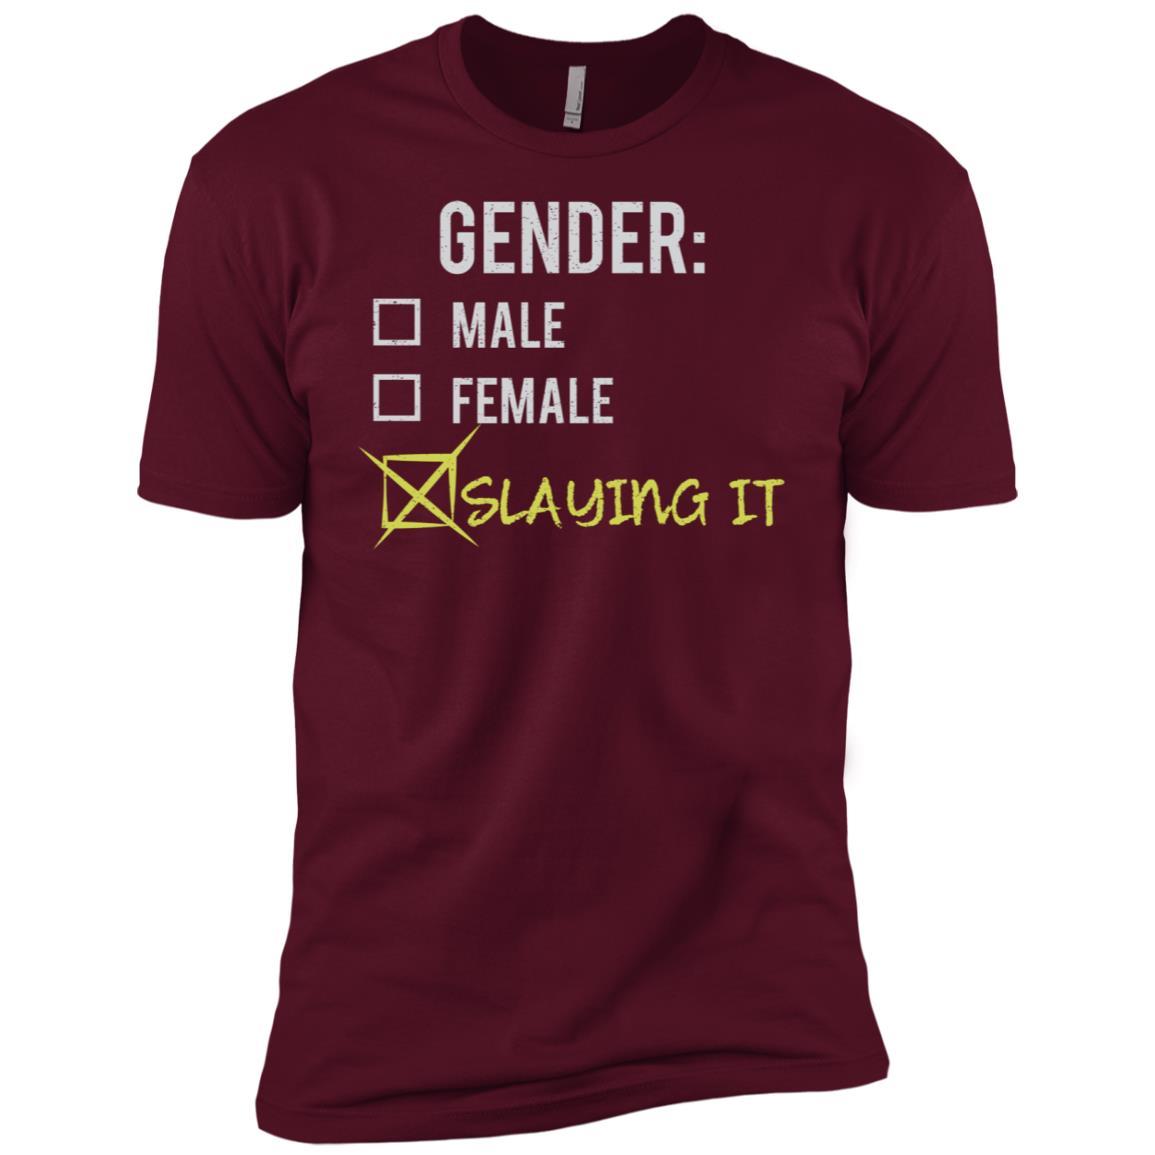 Male Female Slaying It Gender Nonbinary Trans Men Short Sleeve T-Shirt